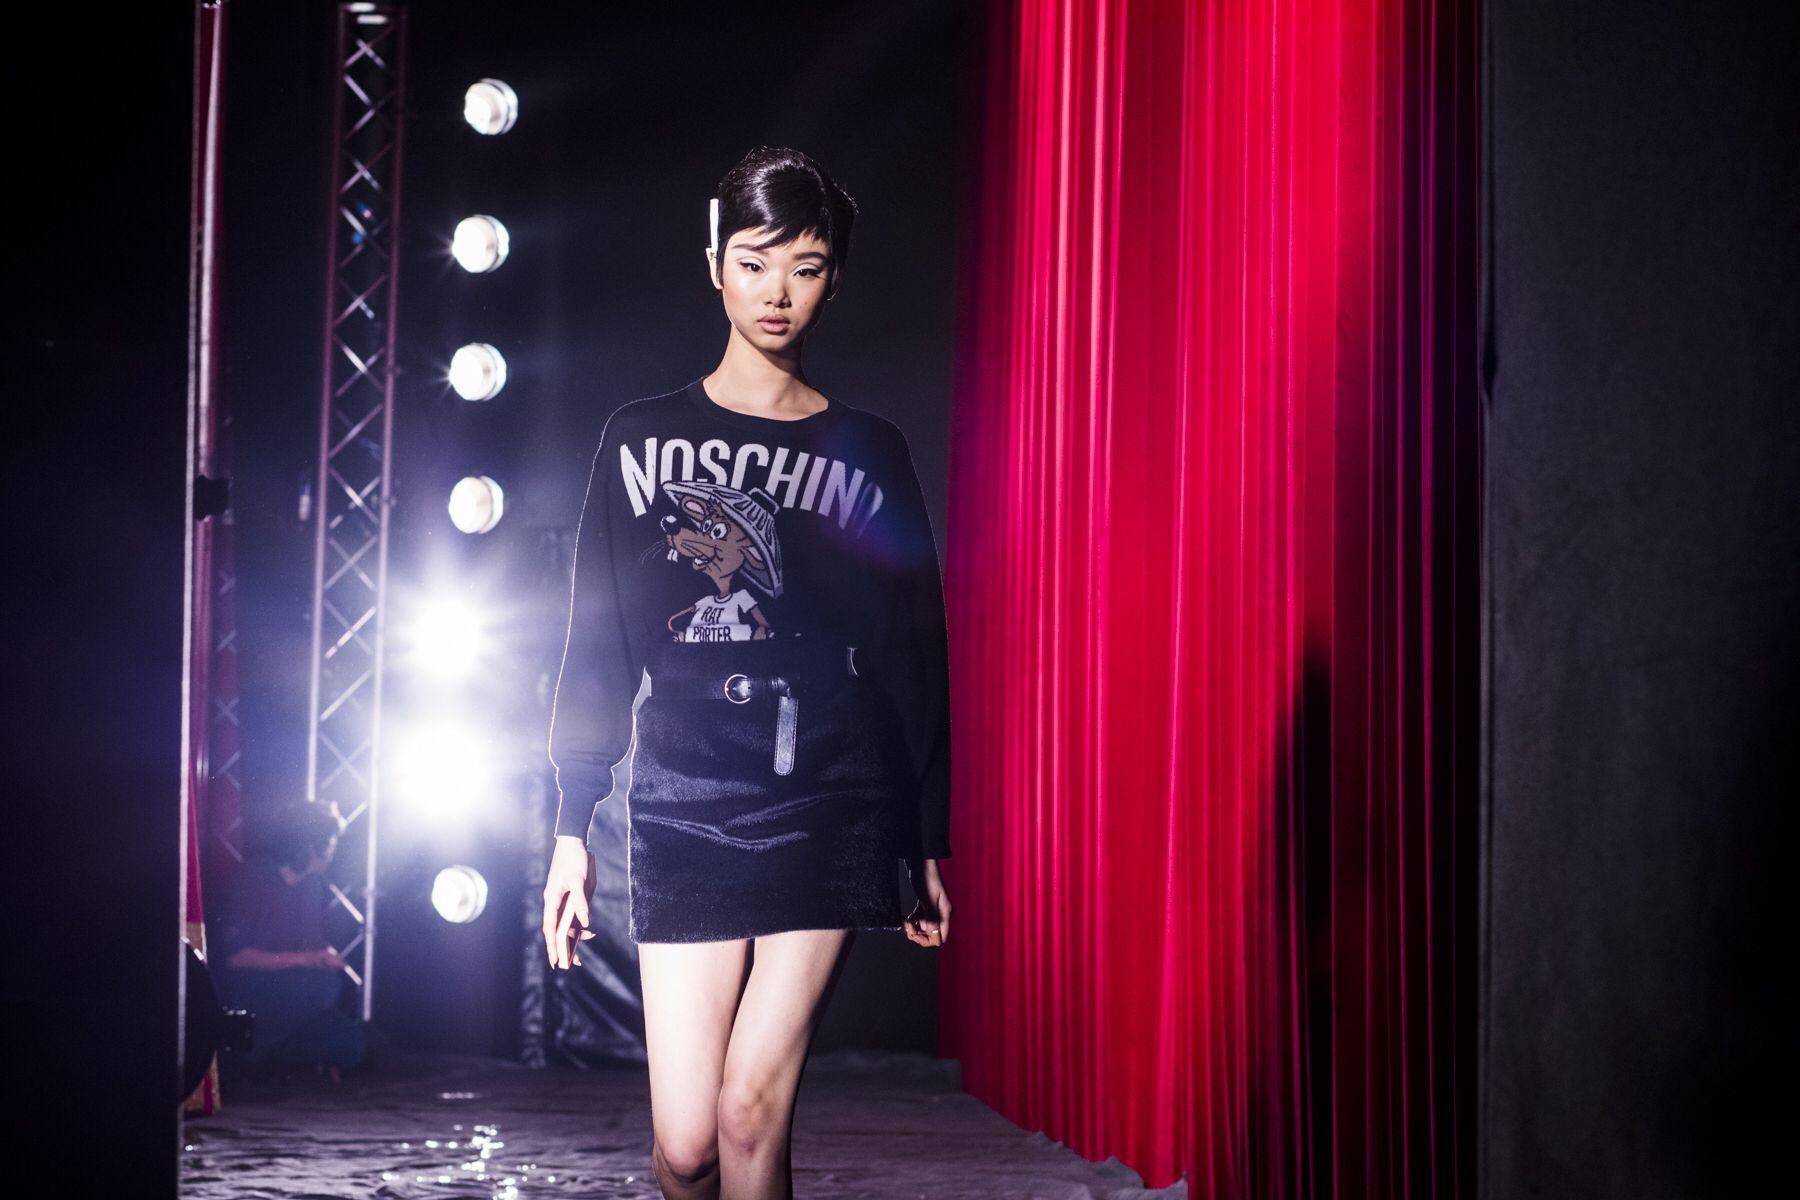 Backstage Moschino, Milan Fashion Week, FALL 2017